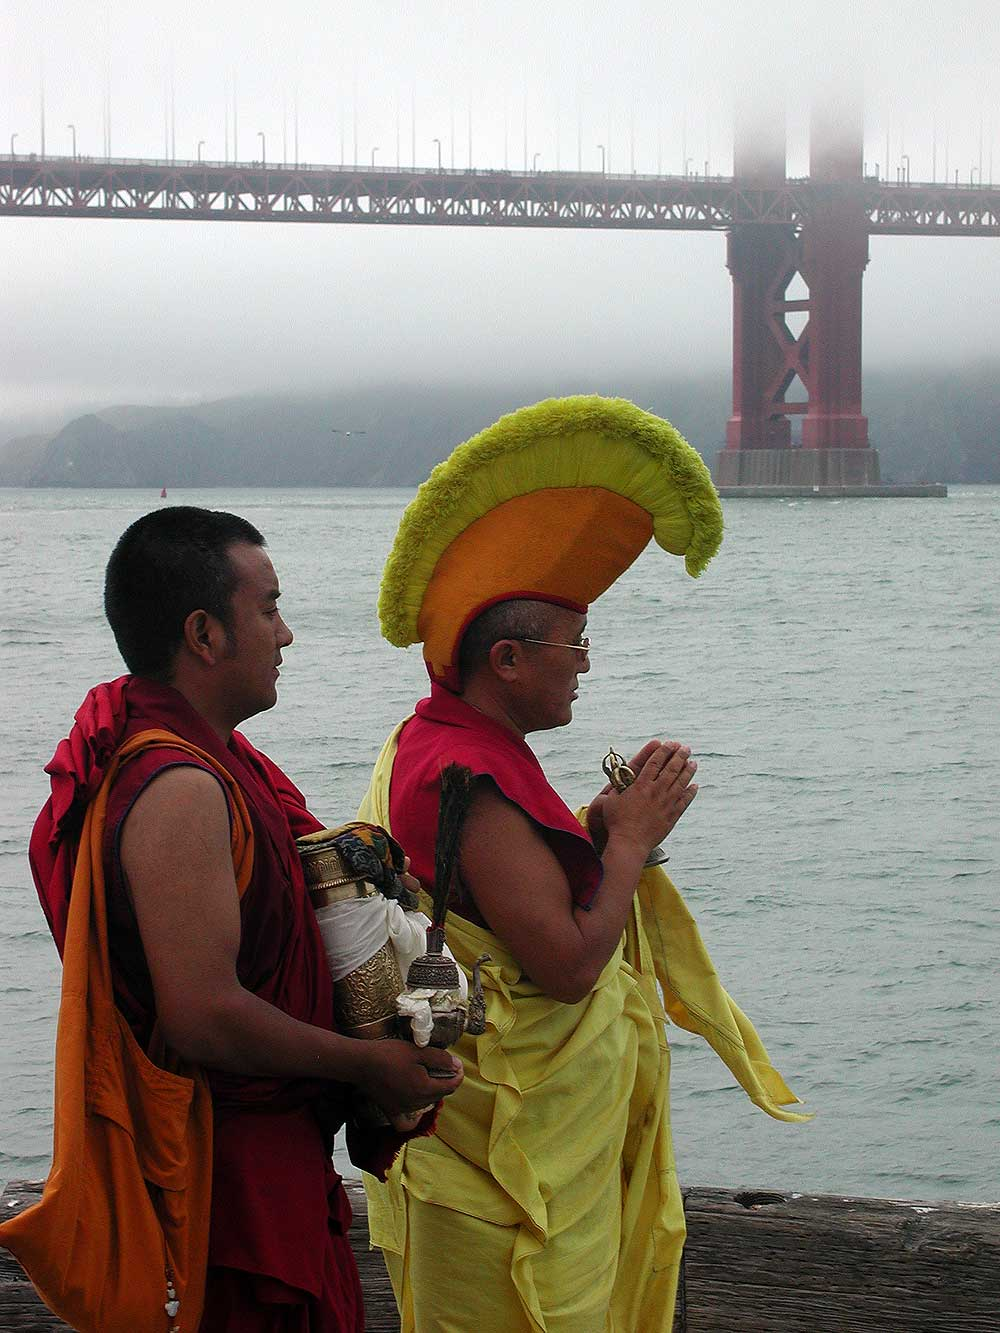 Buddhist monks perform a ritual at the Golden Gate Bridge